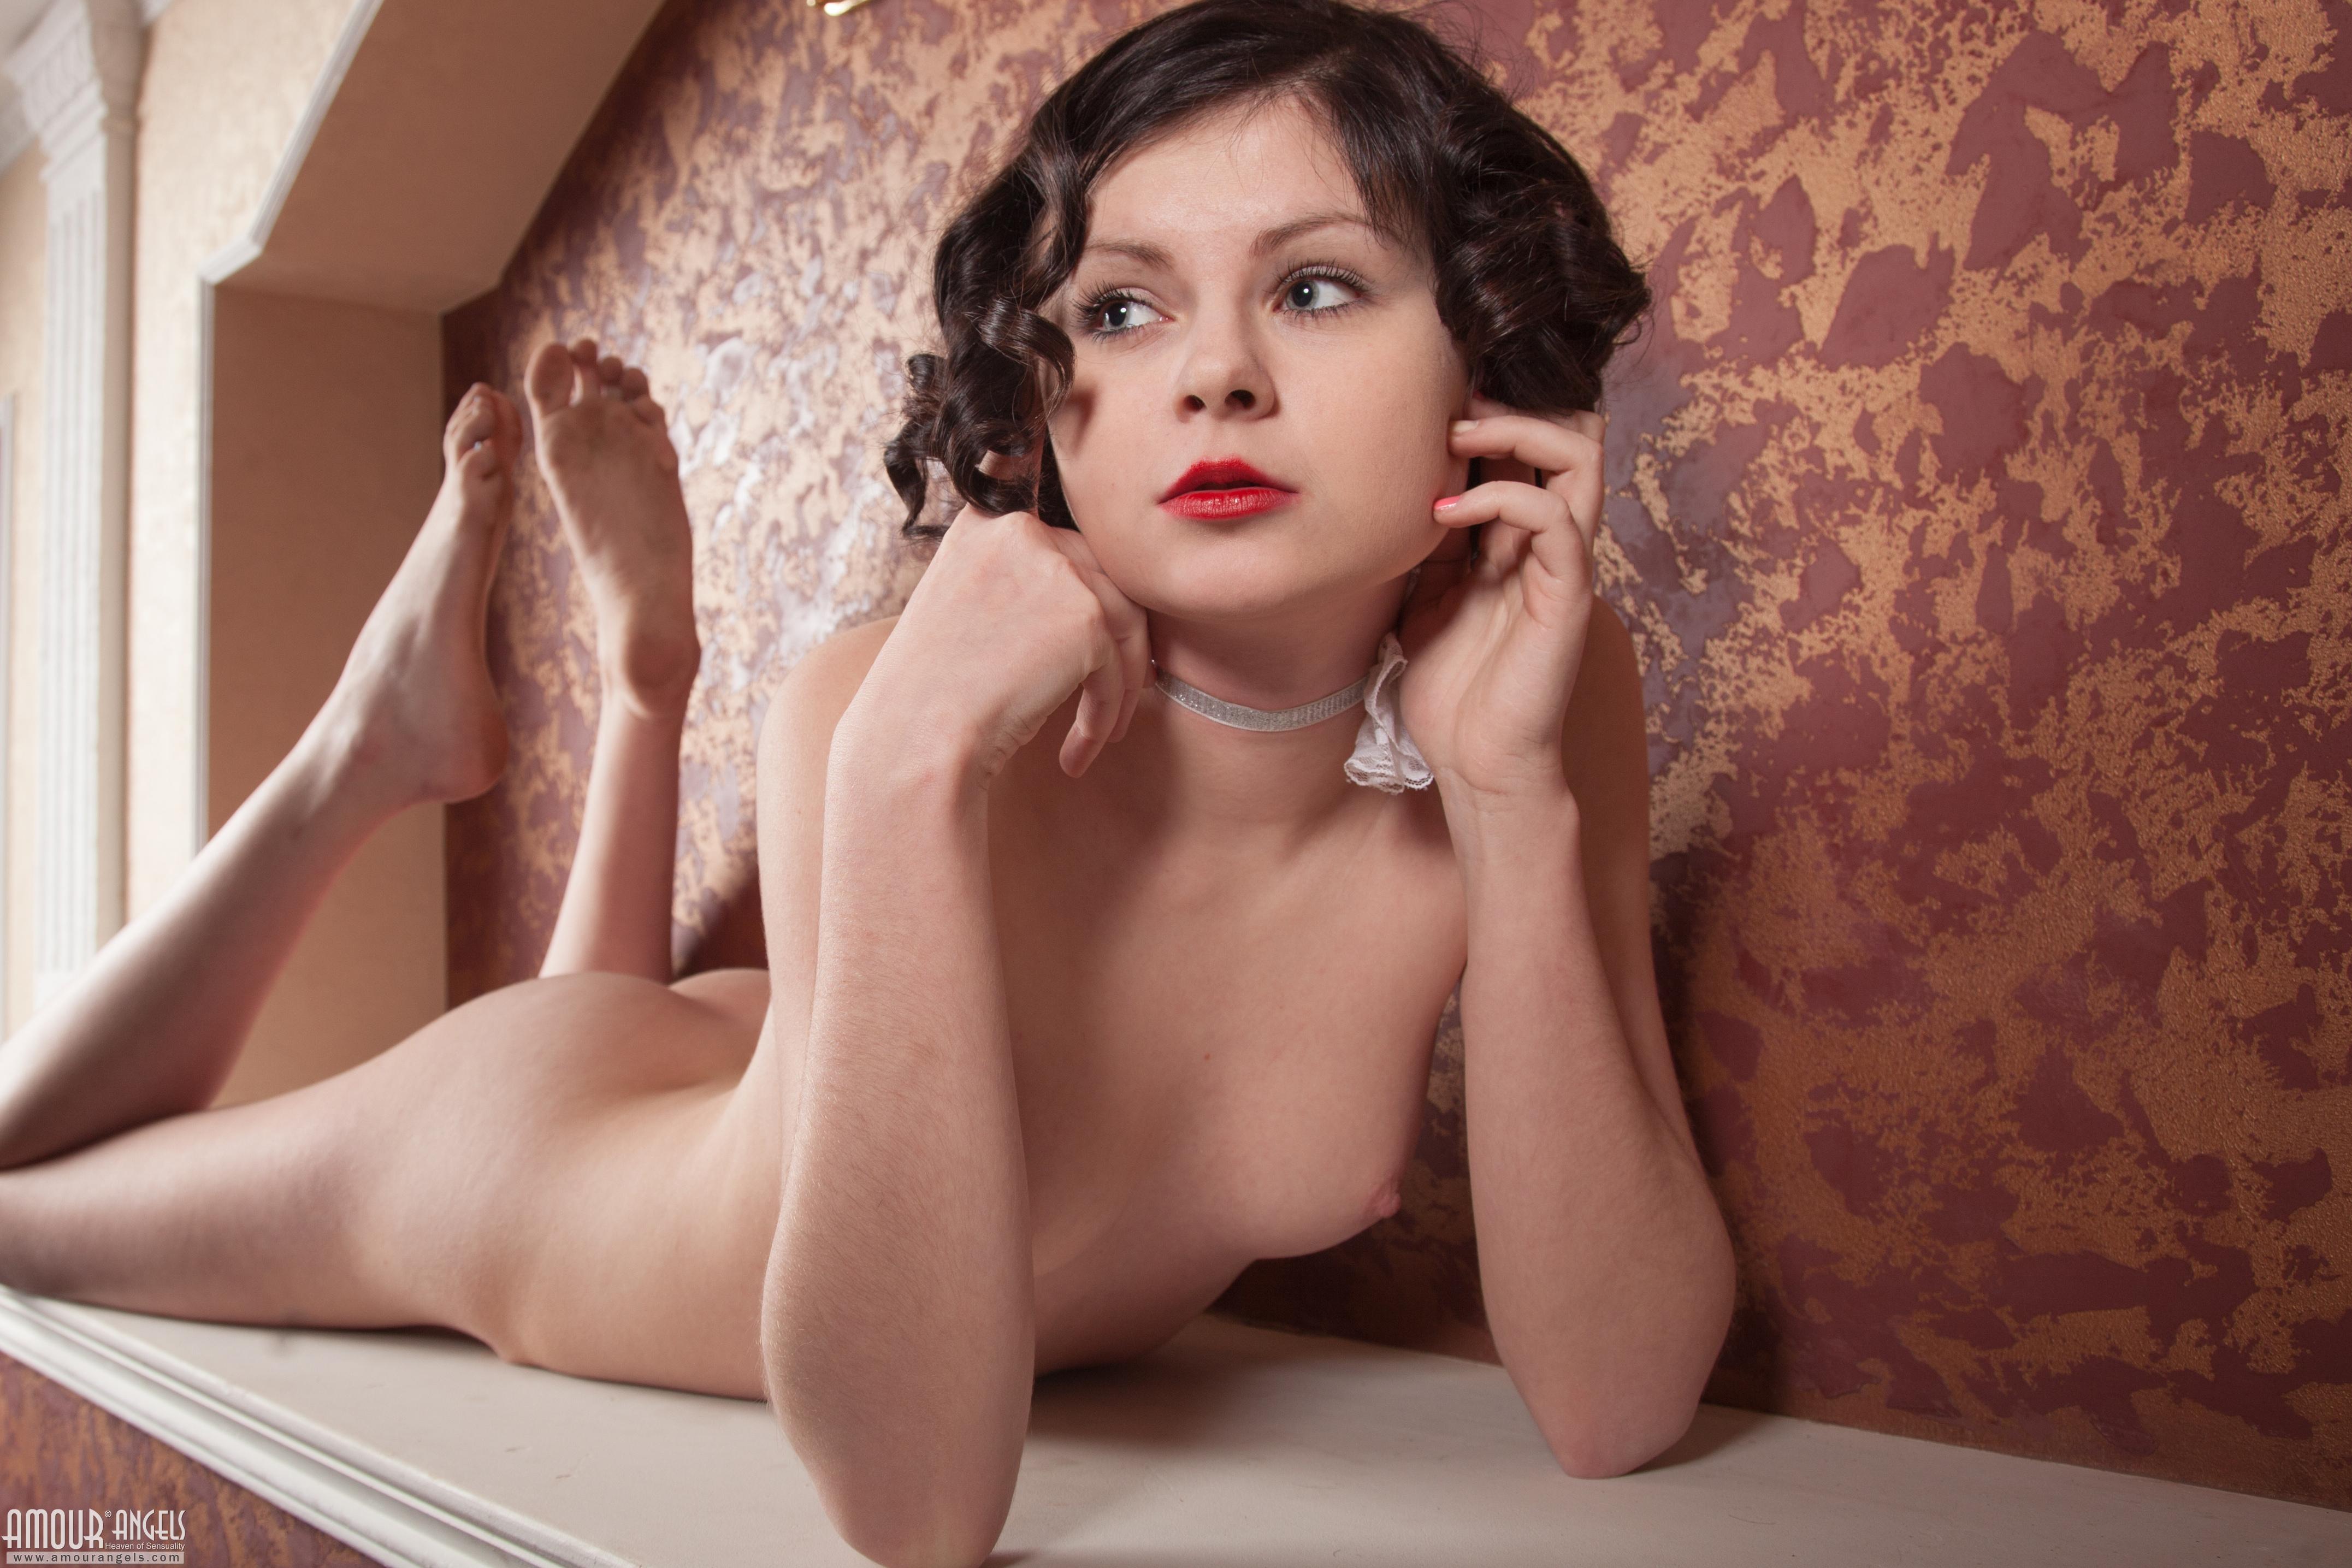 Nude angel photos